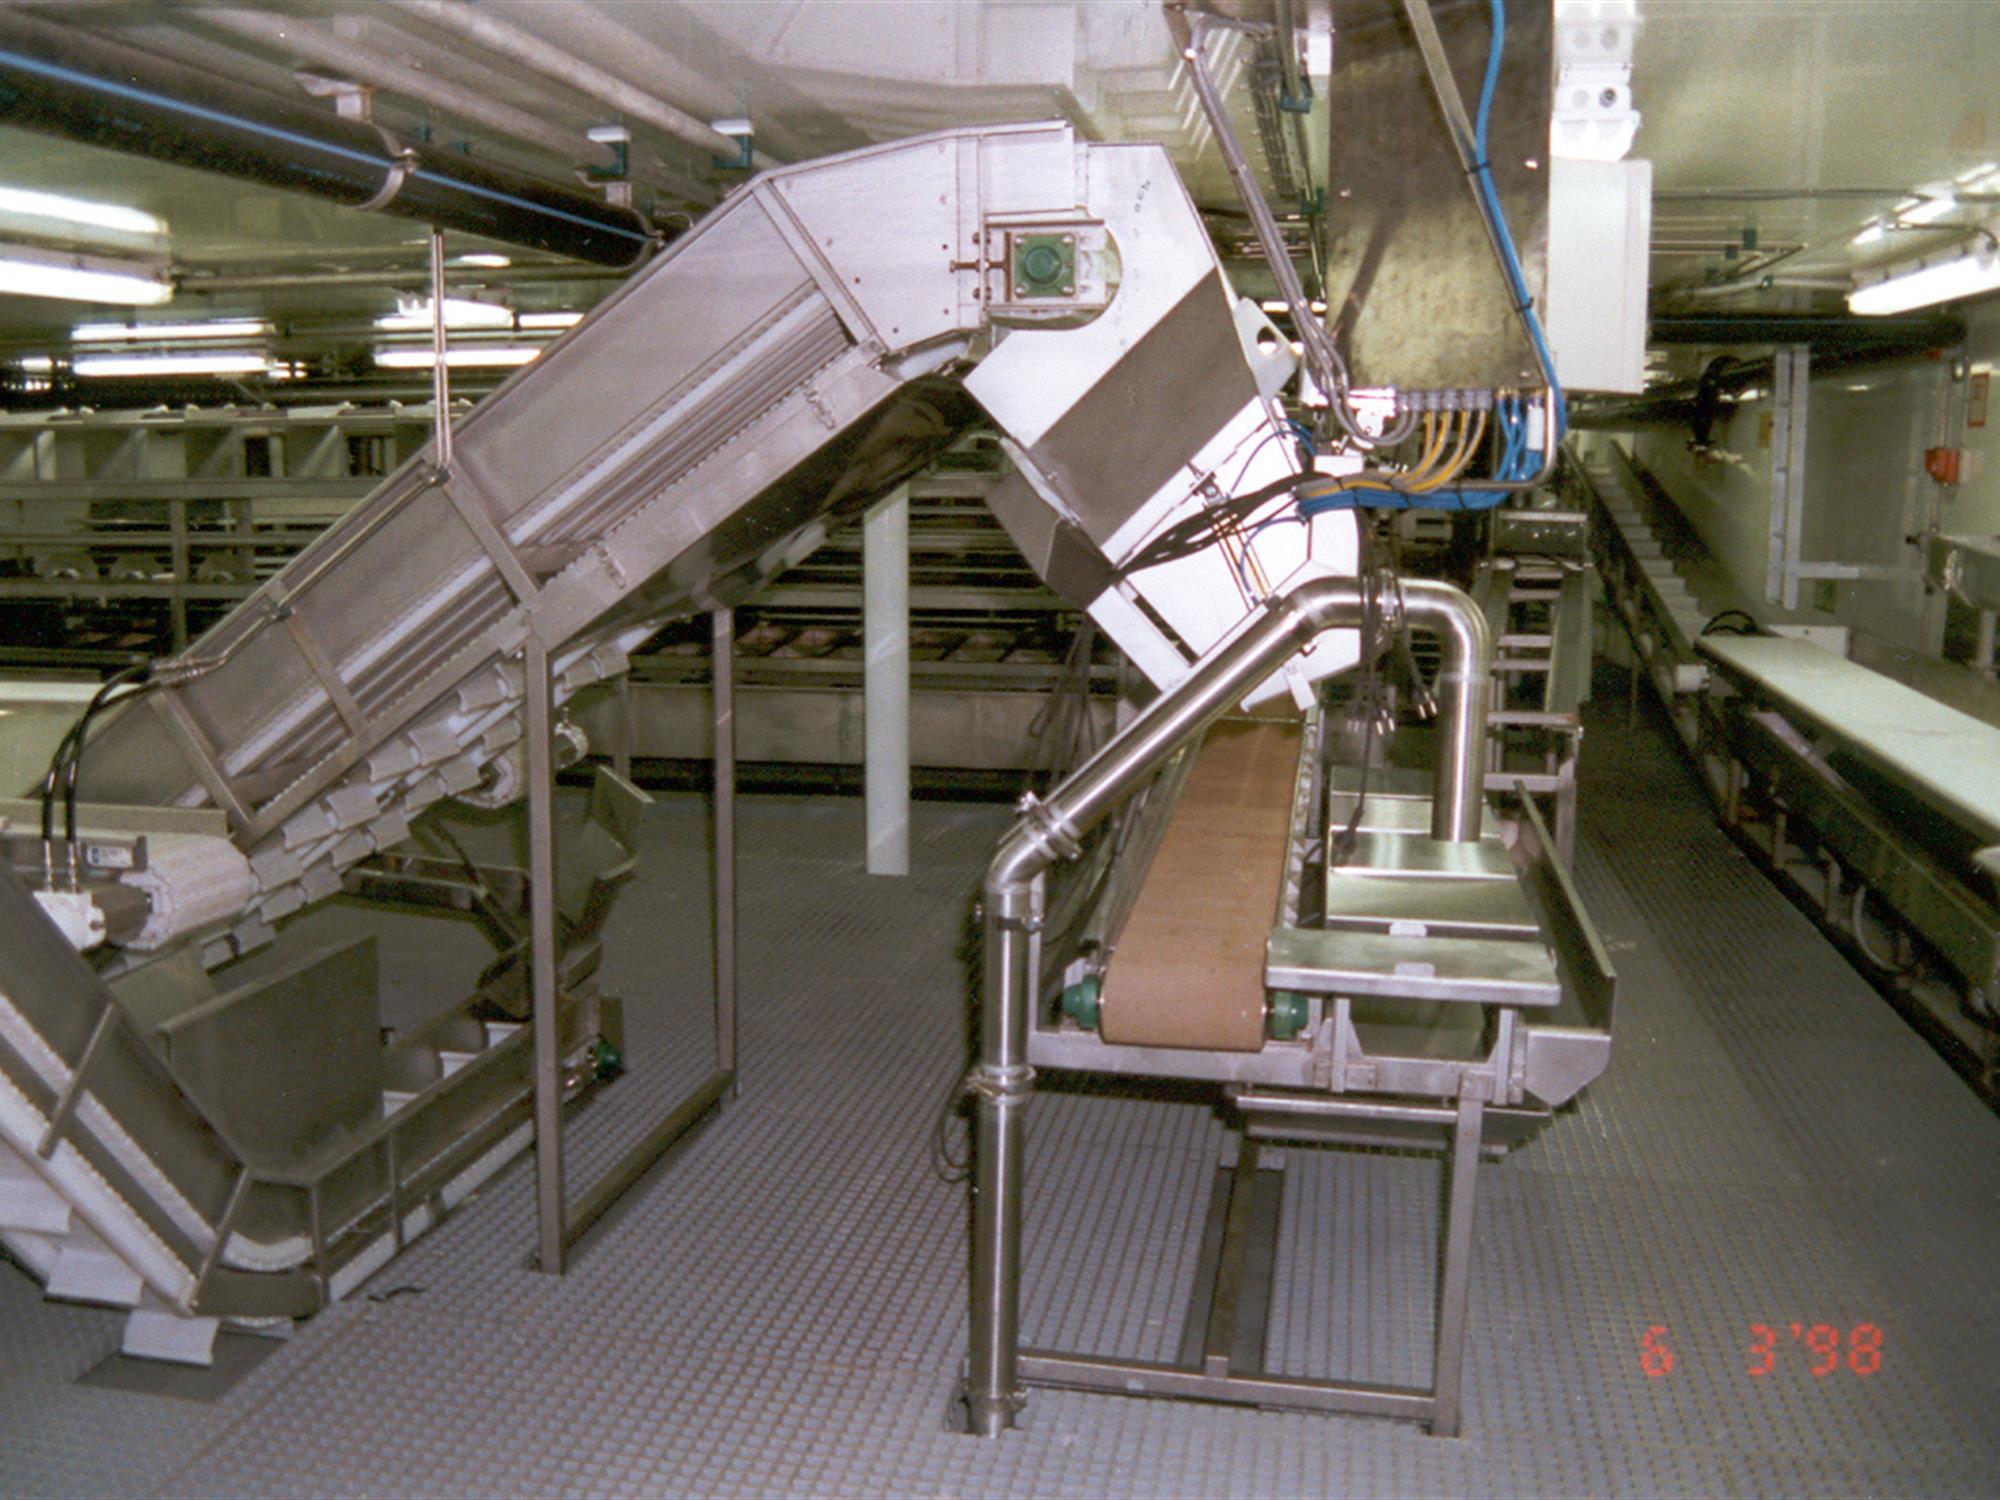 Weighingstation